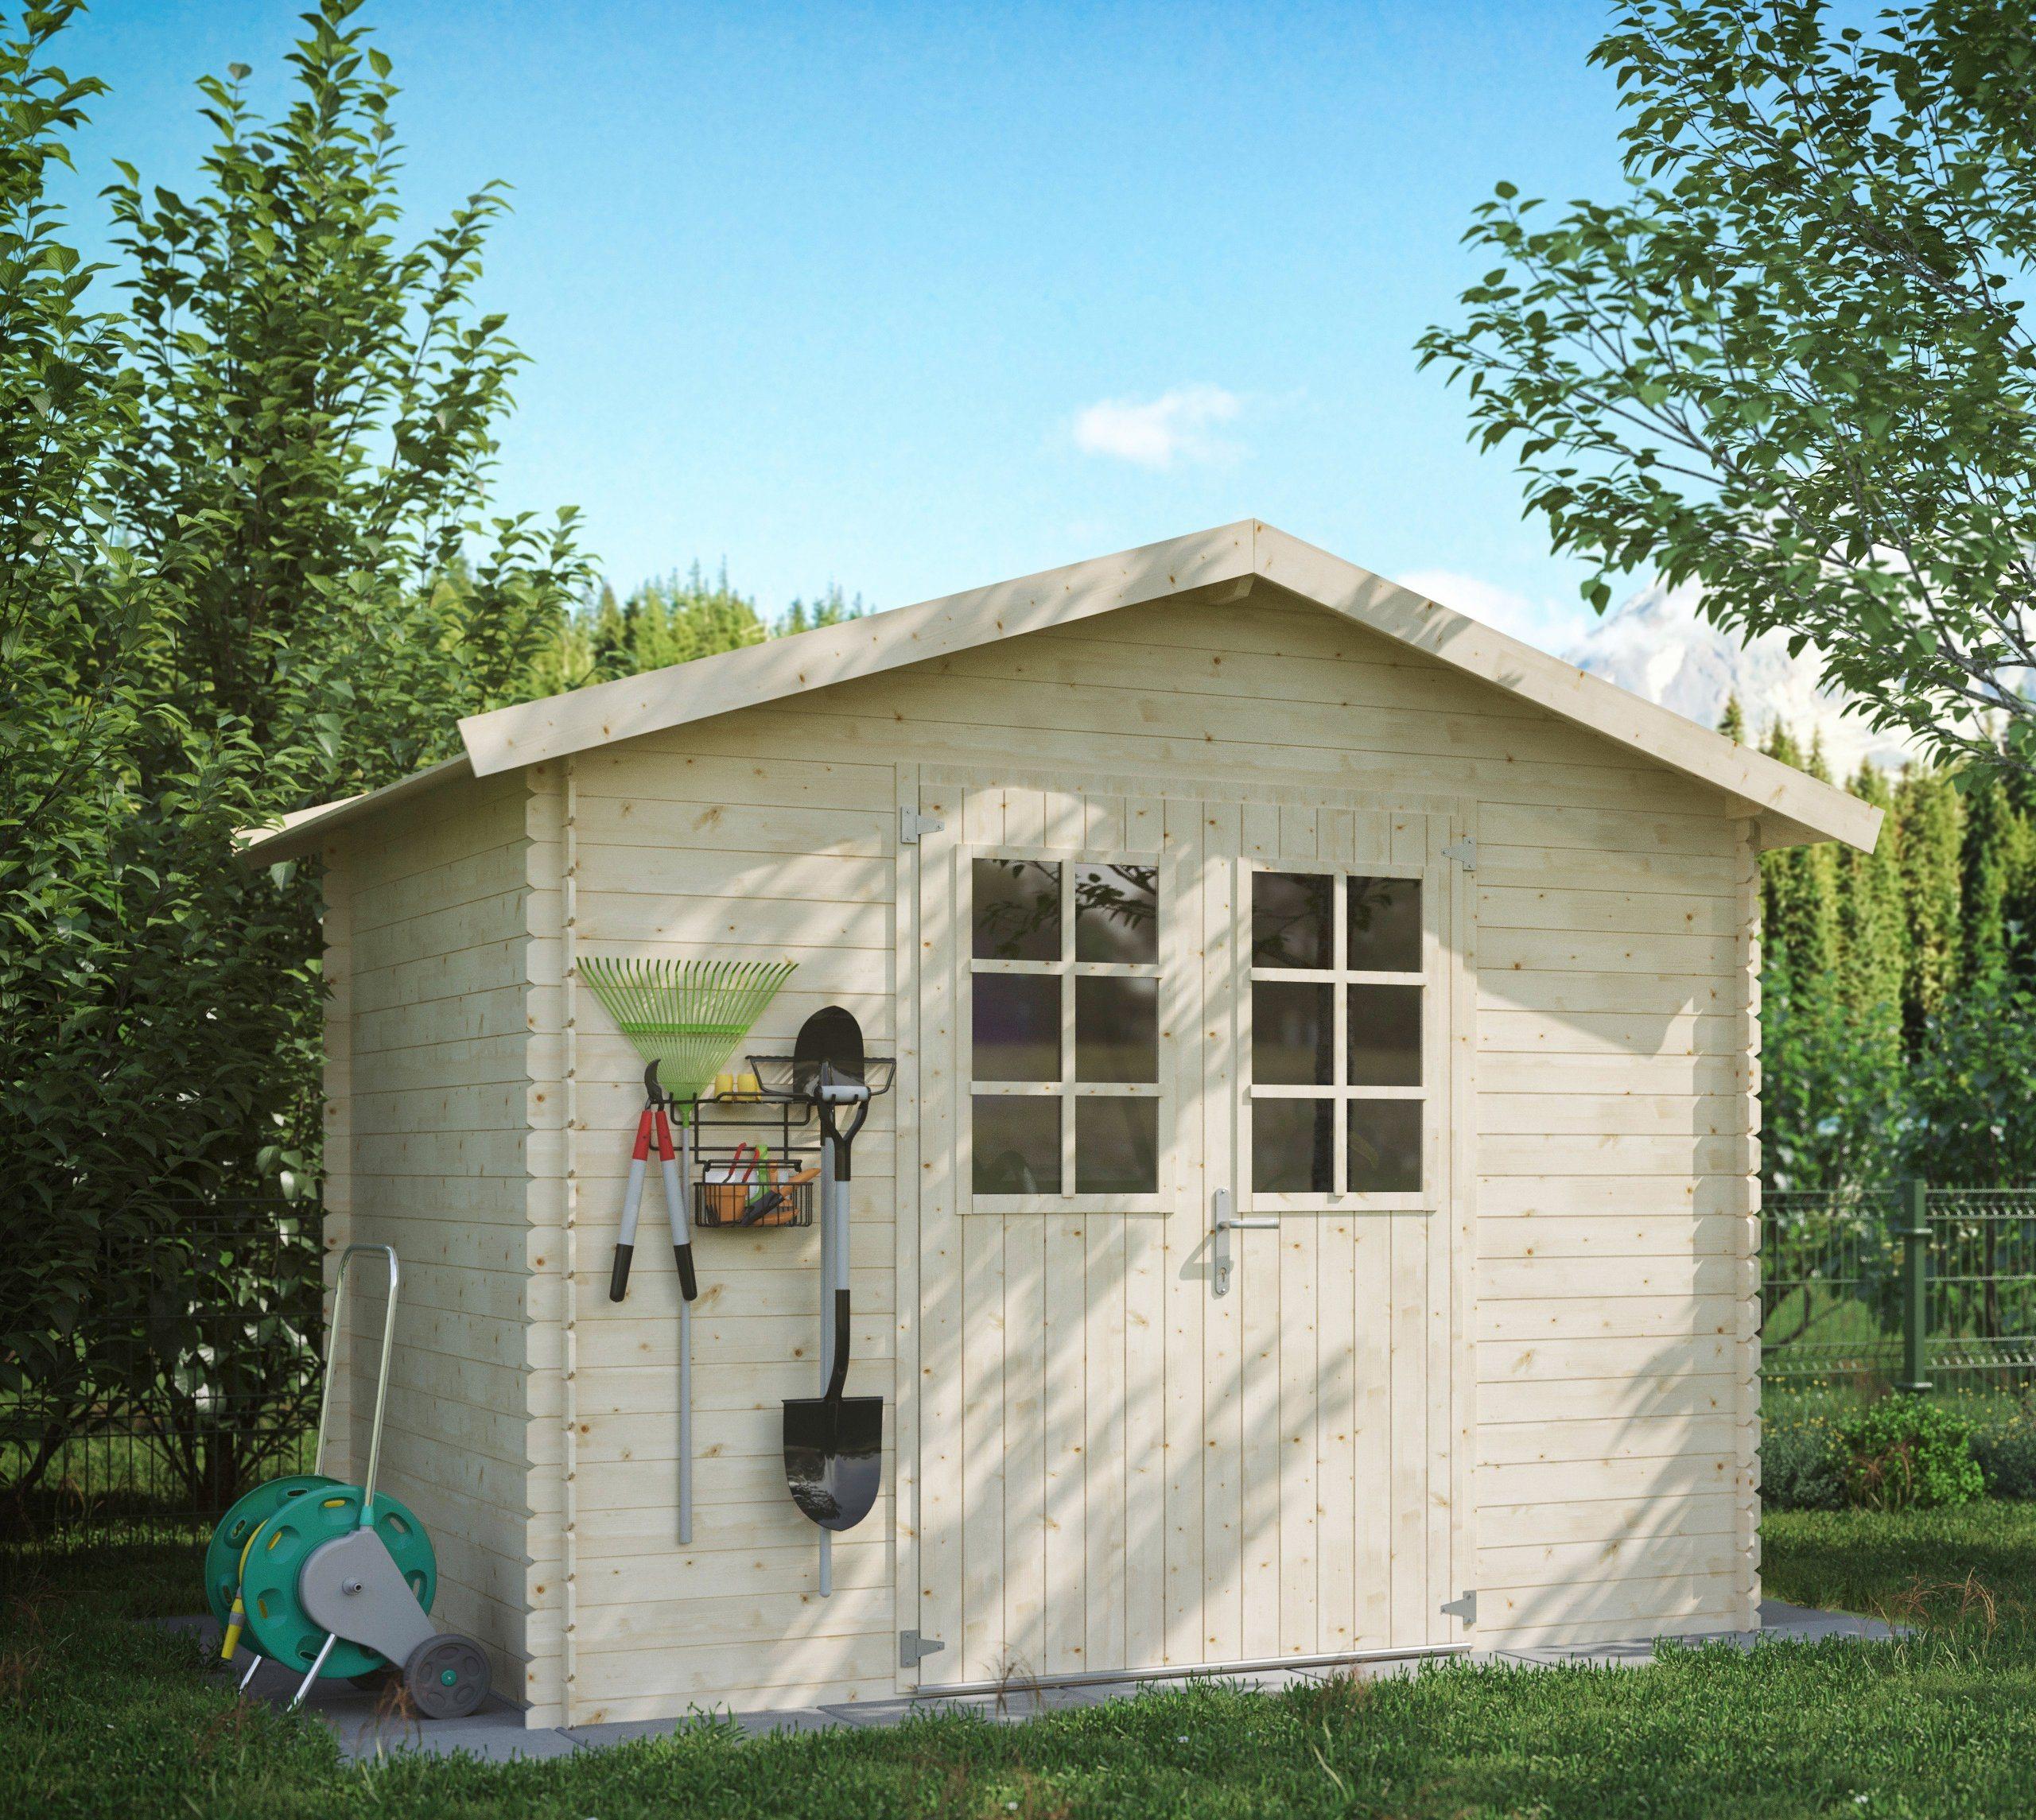 LUOMAN Gartenhaus »Lillevilla 141«, BxT: 260x180 cm, 19 mm, inkl. Aufbau | Garten > Gartenhäuser | Luoman